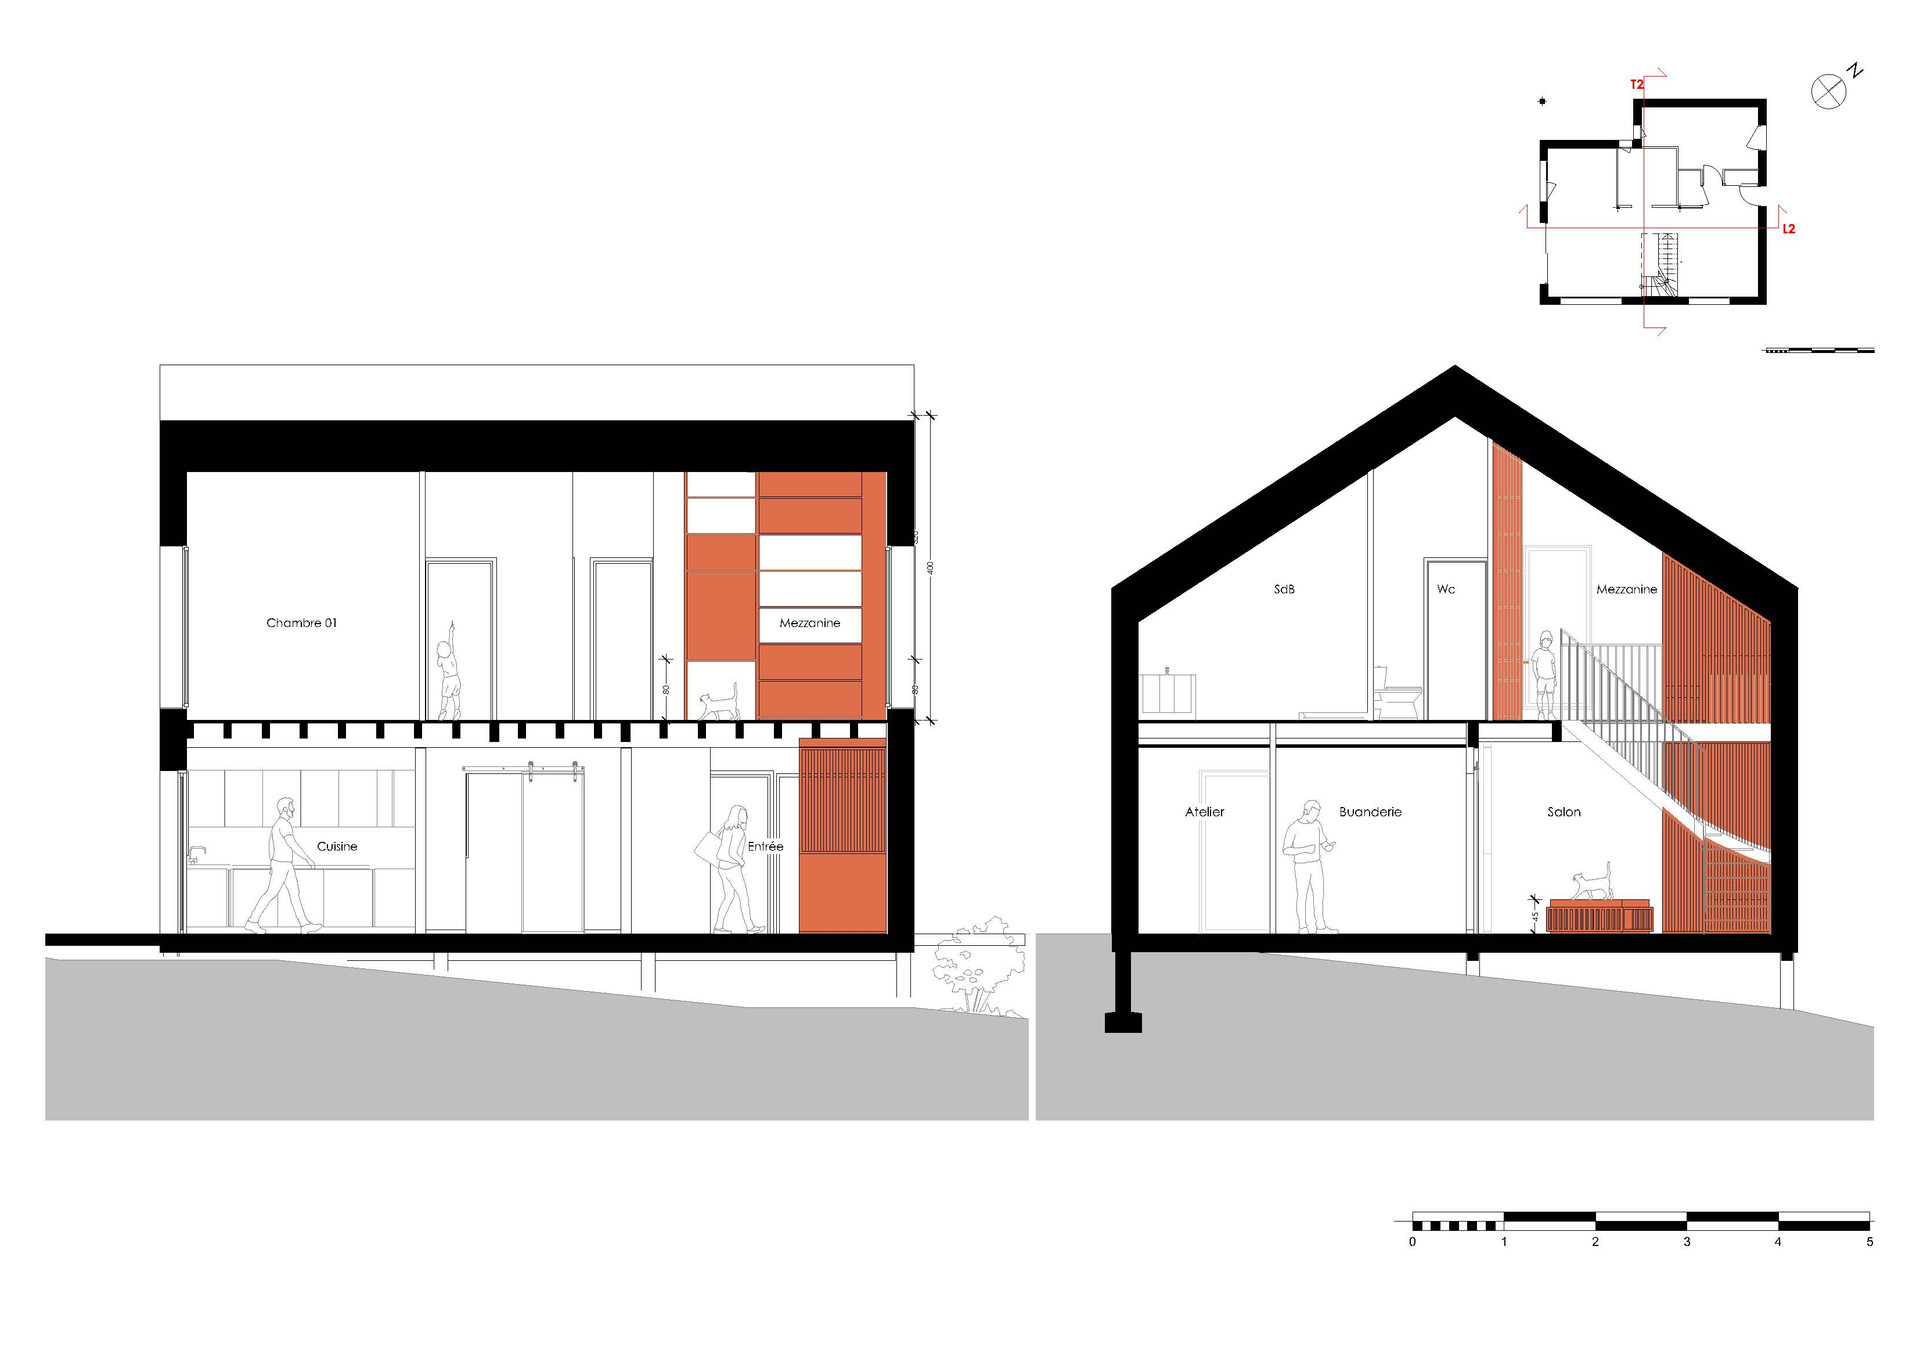 Hirundo-Architecture_Projet B&R_Plans_Co